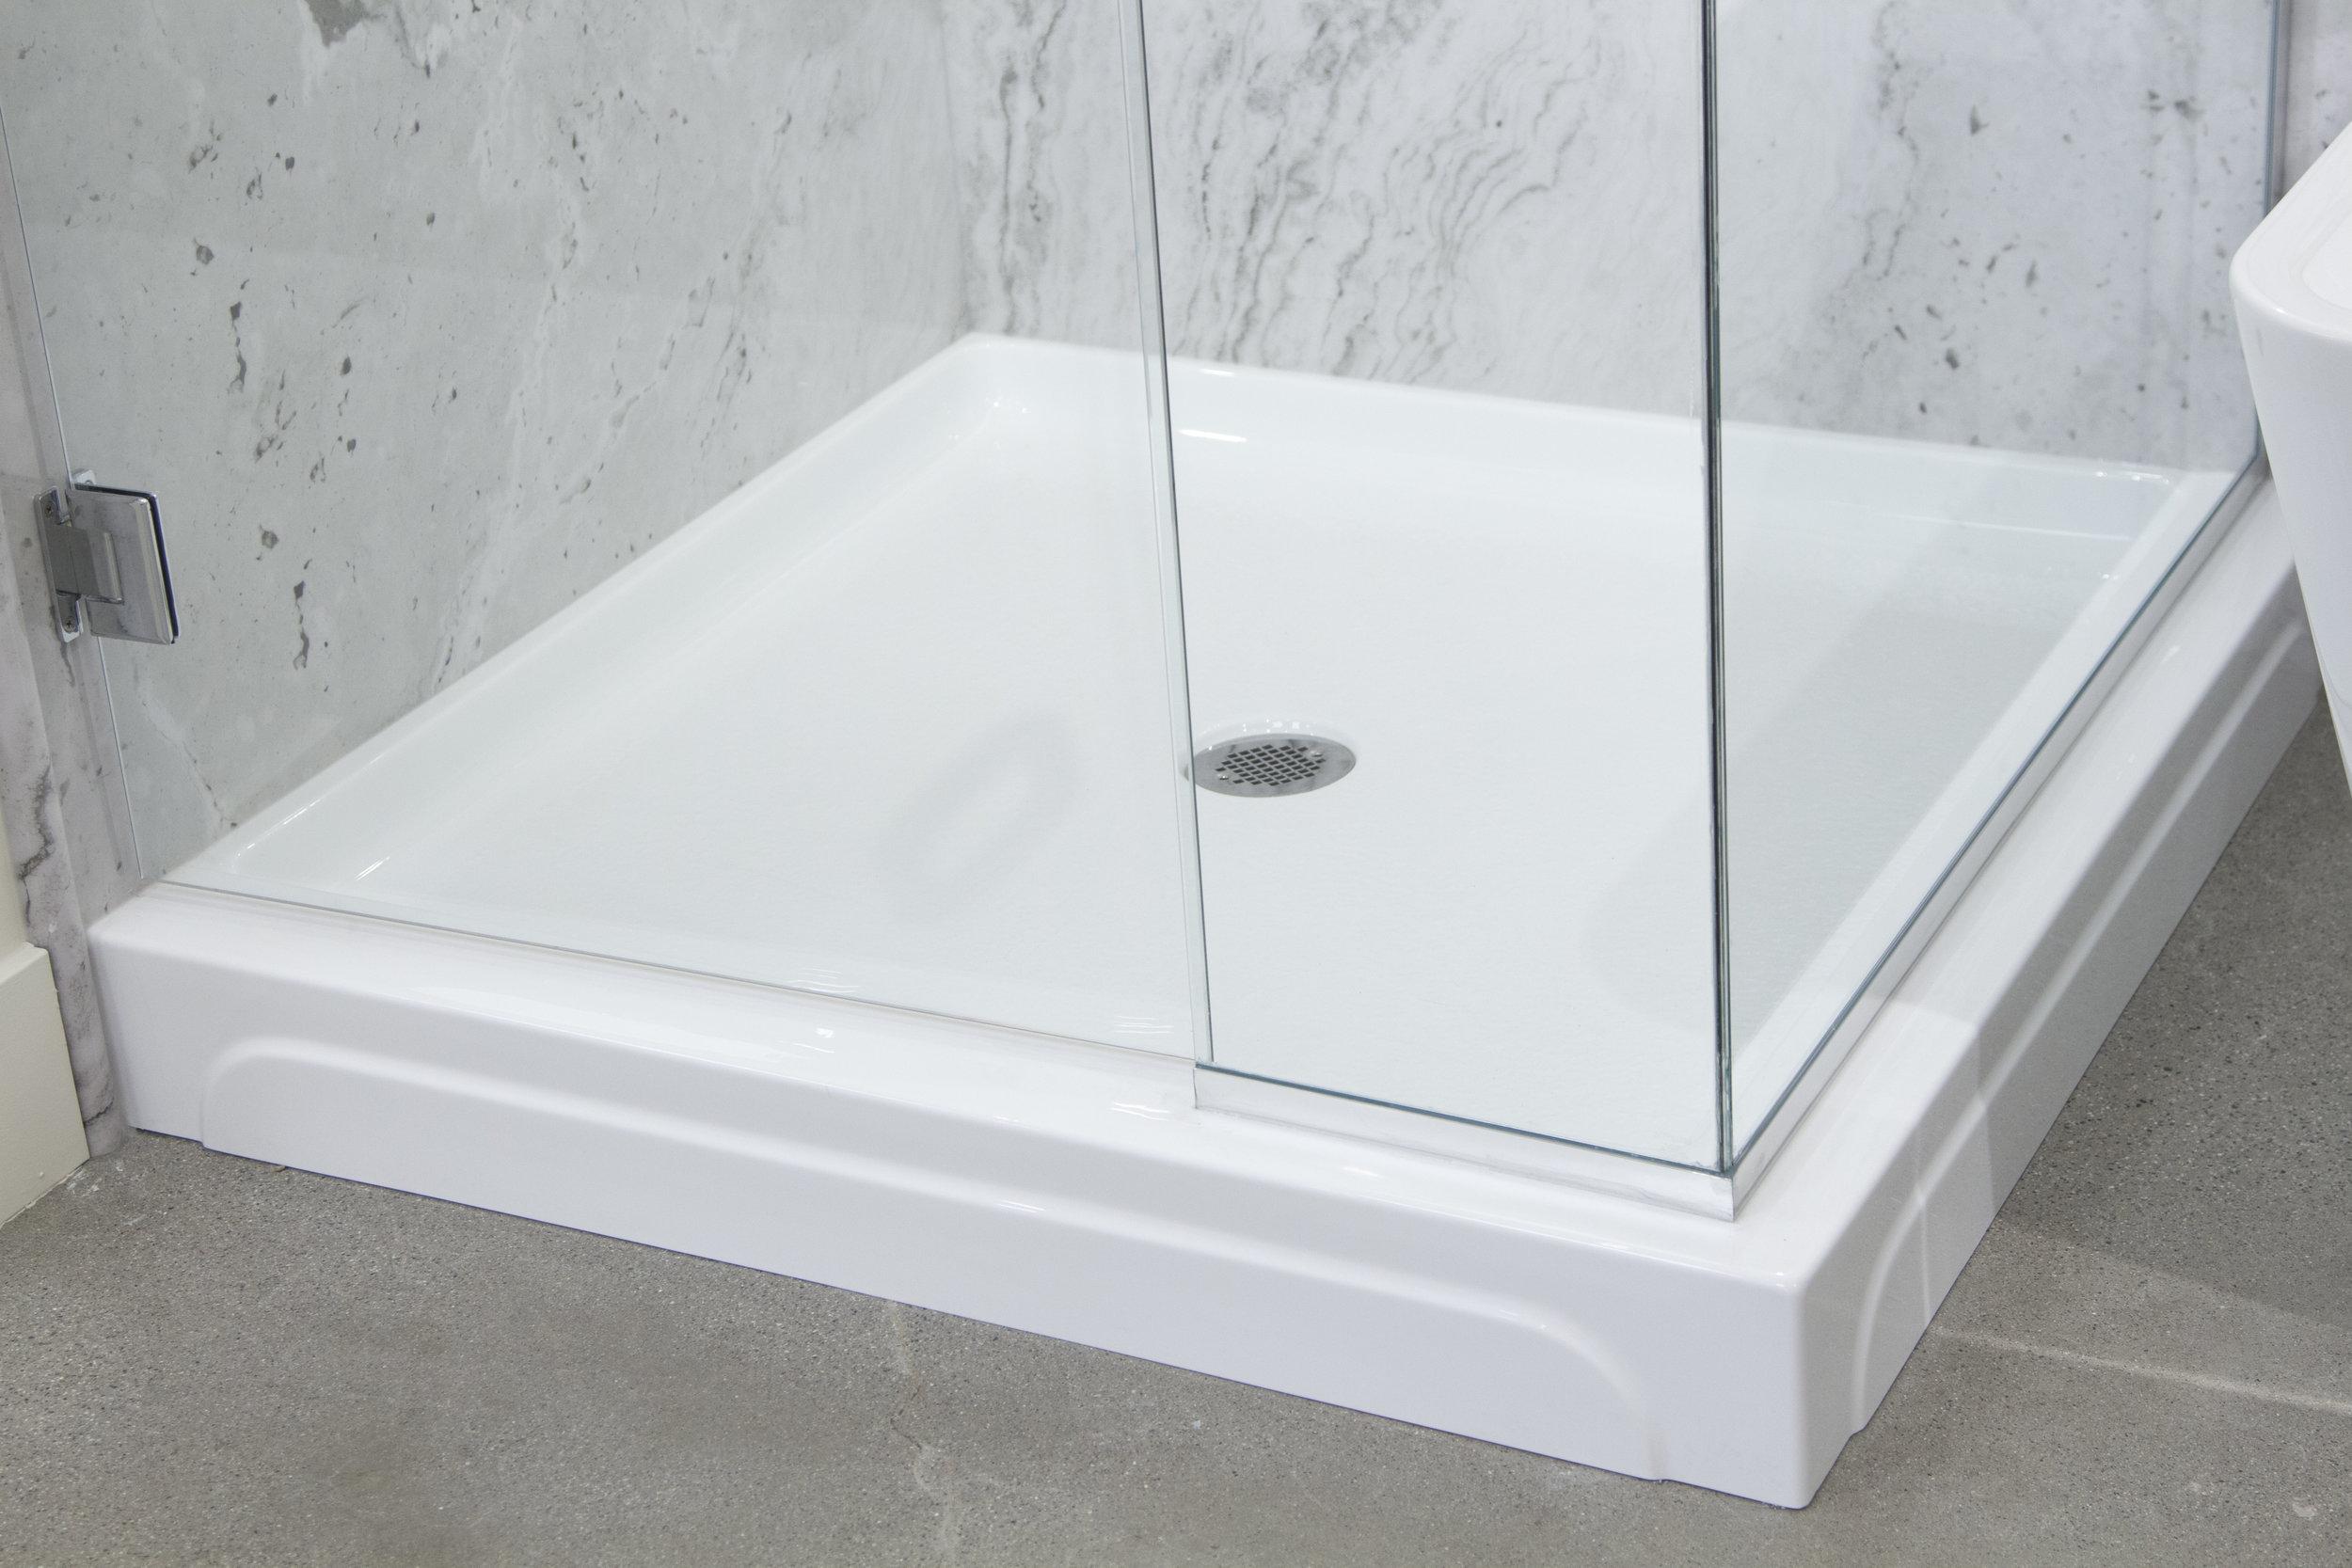 Acrylic Shower Floor_Square.jpg